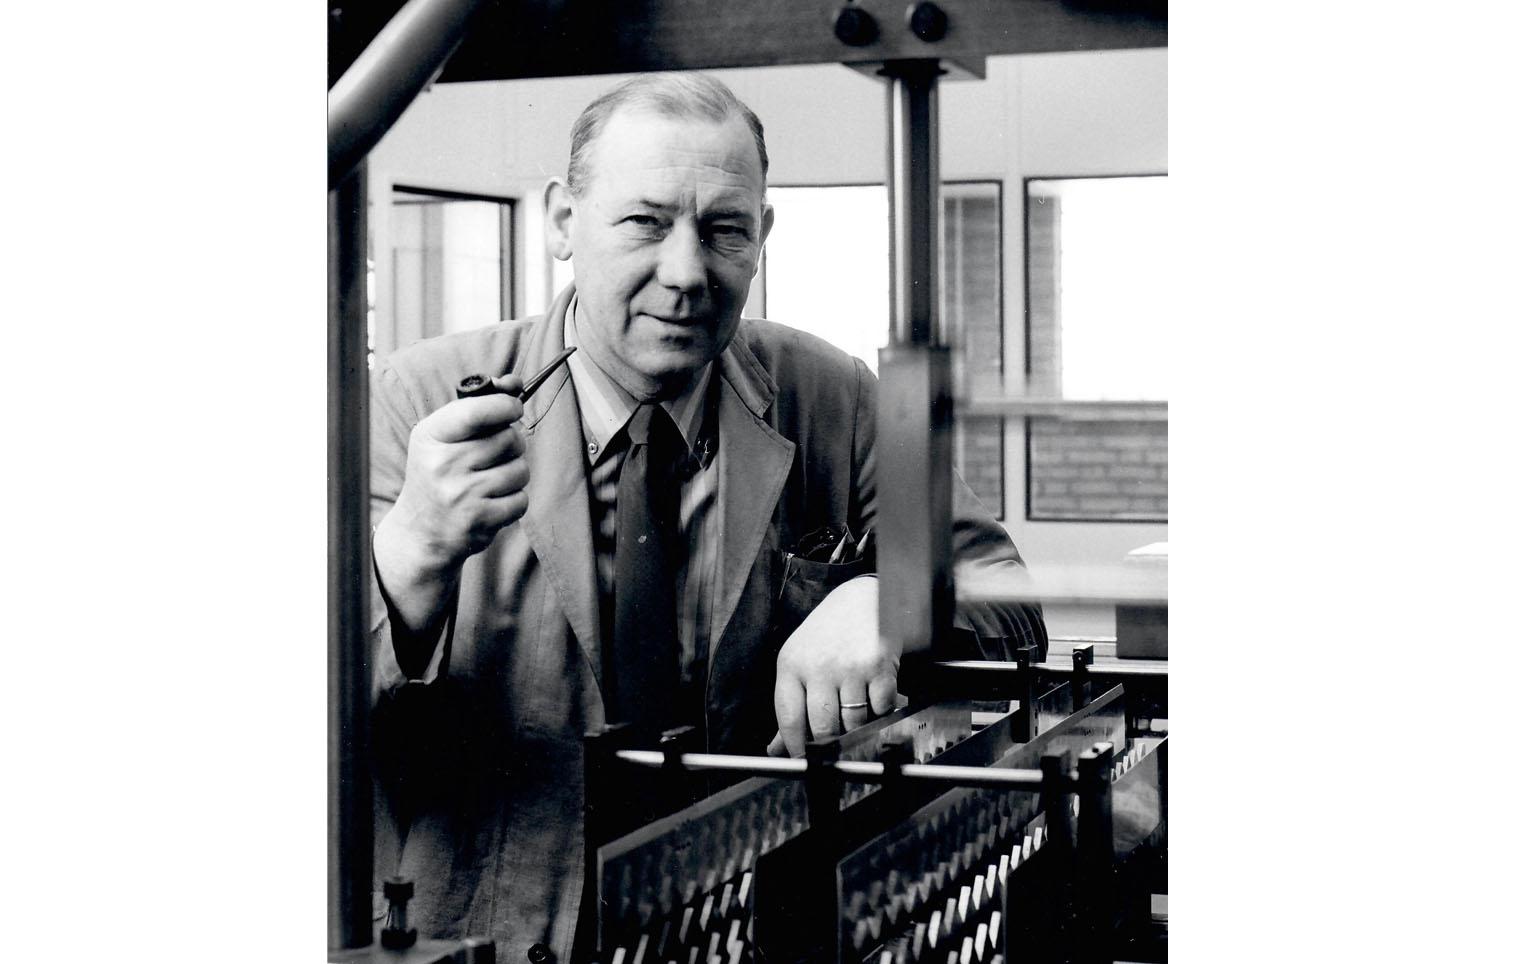 Nils Strandhag